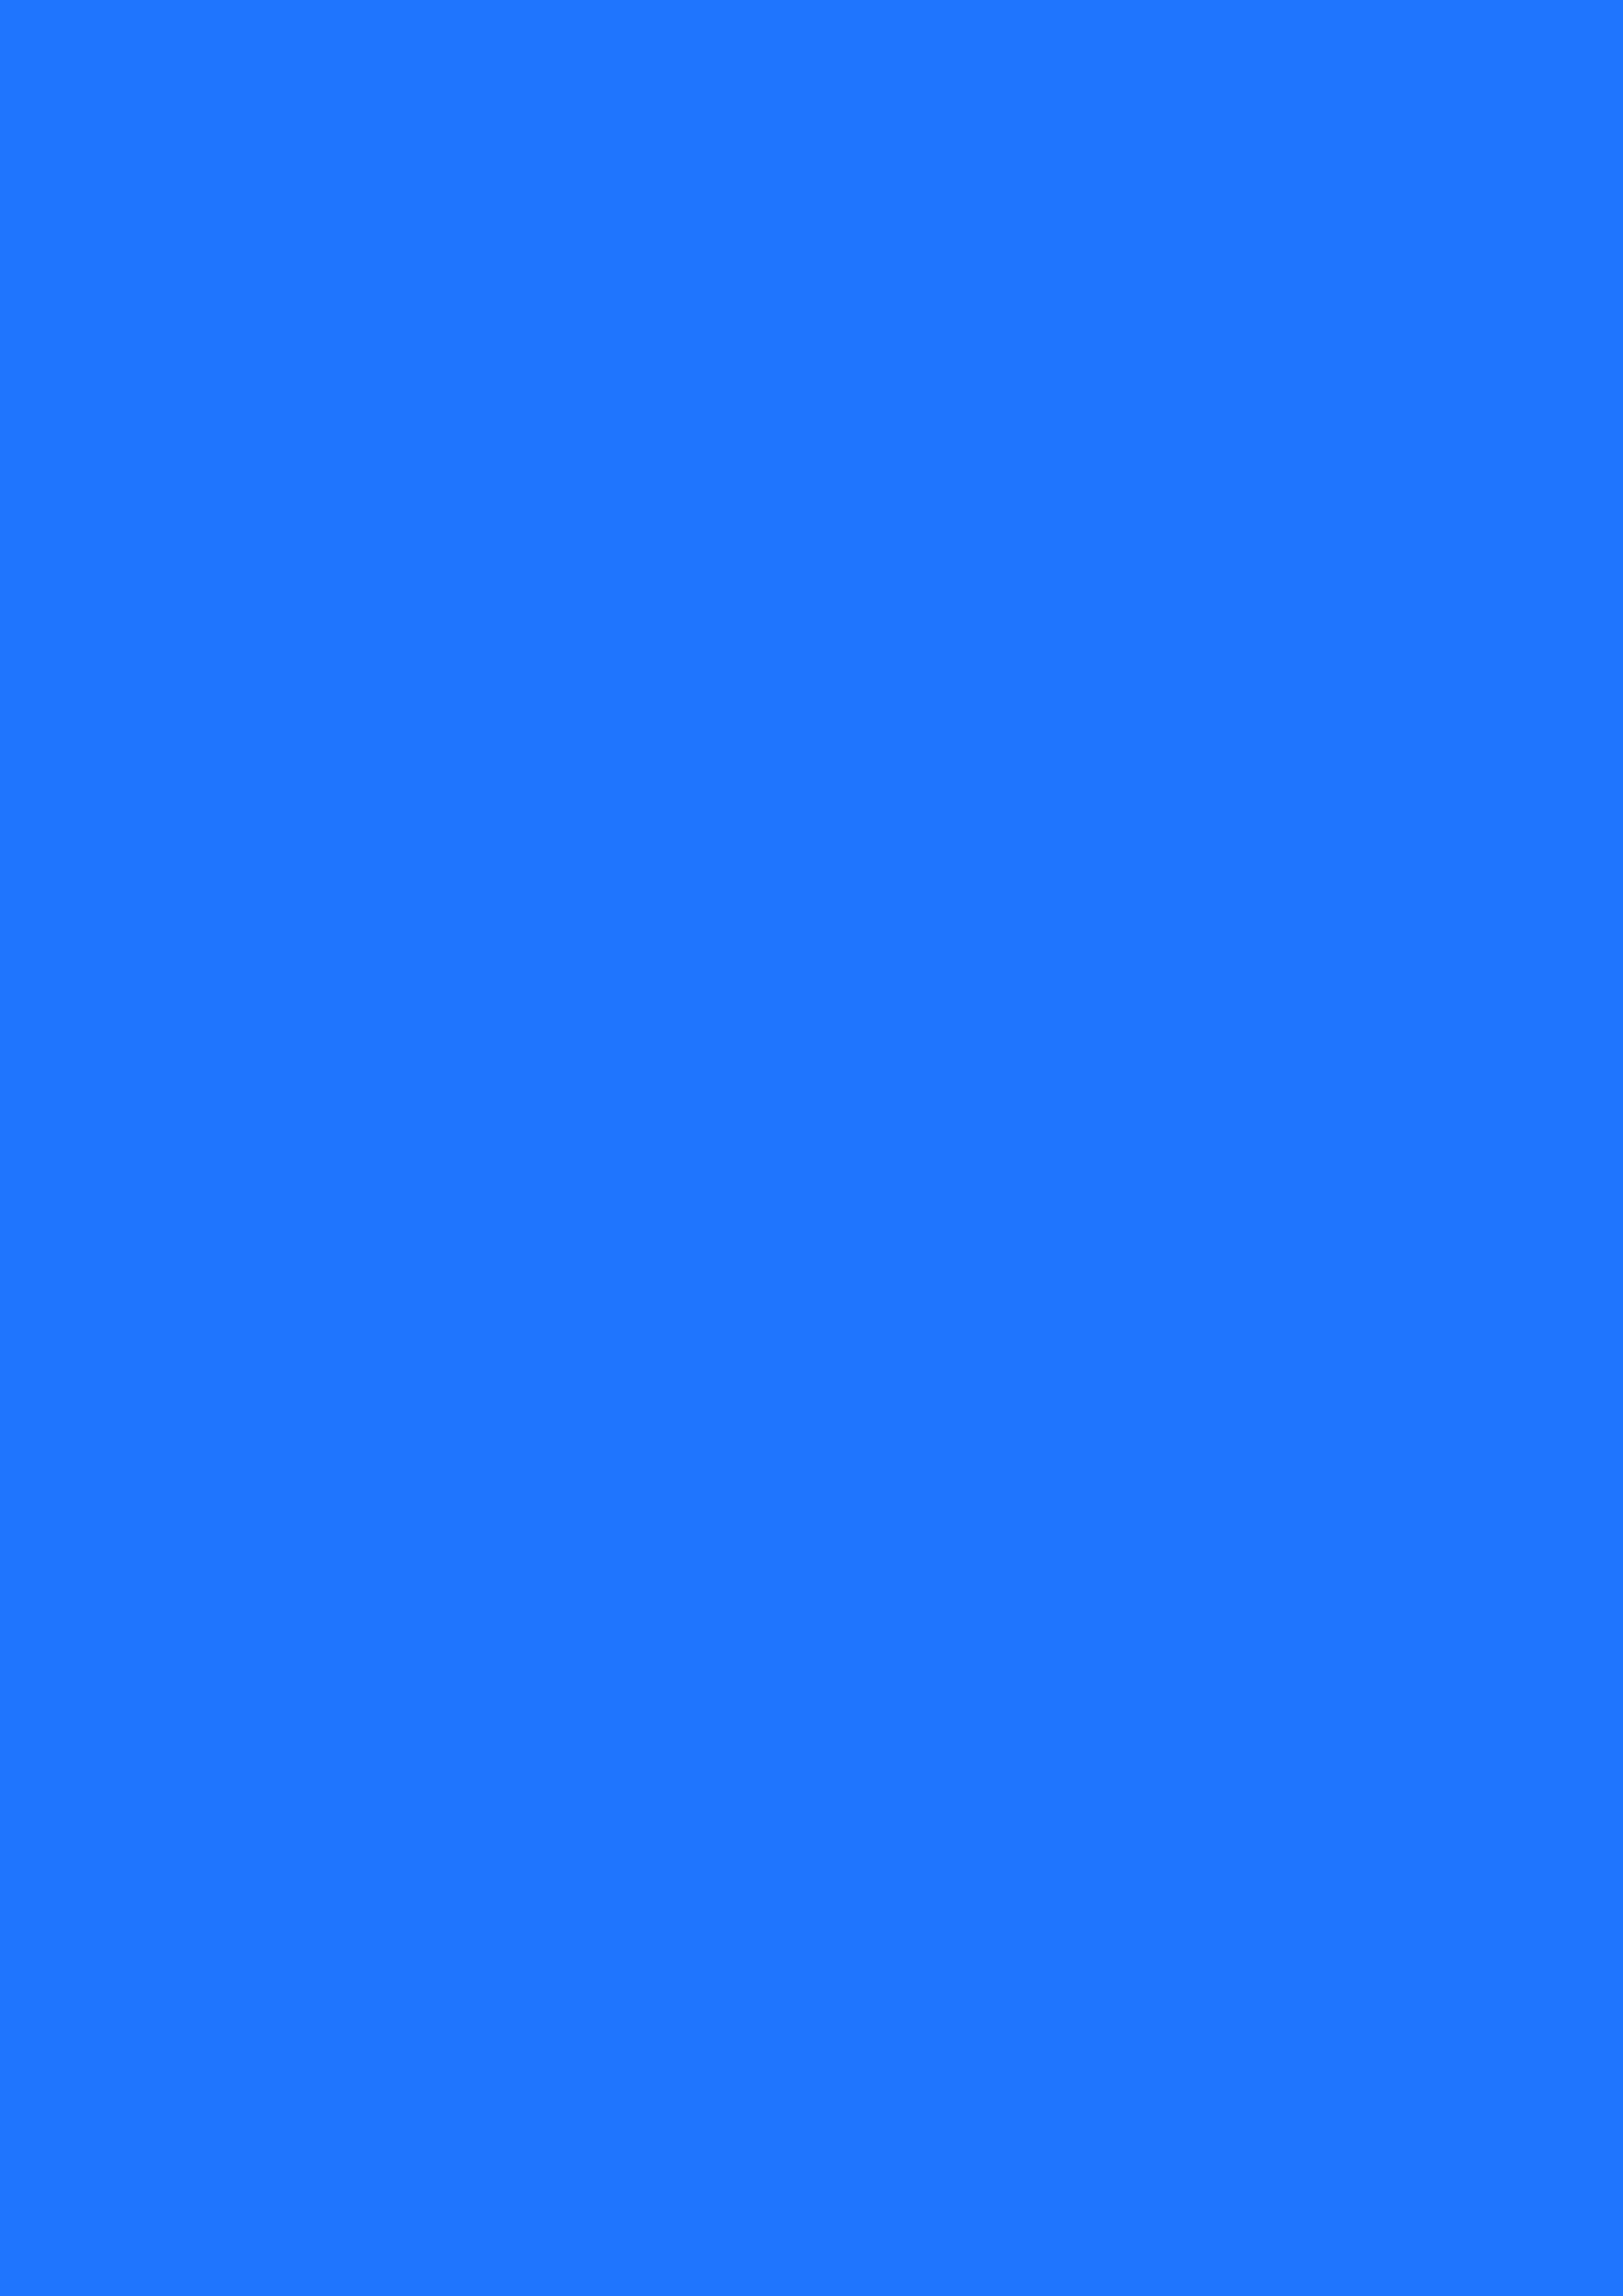 2480x3508 Blue Crayola Solid Color Background